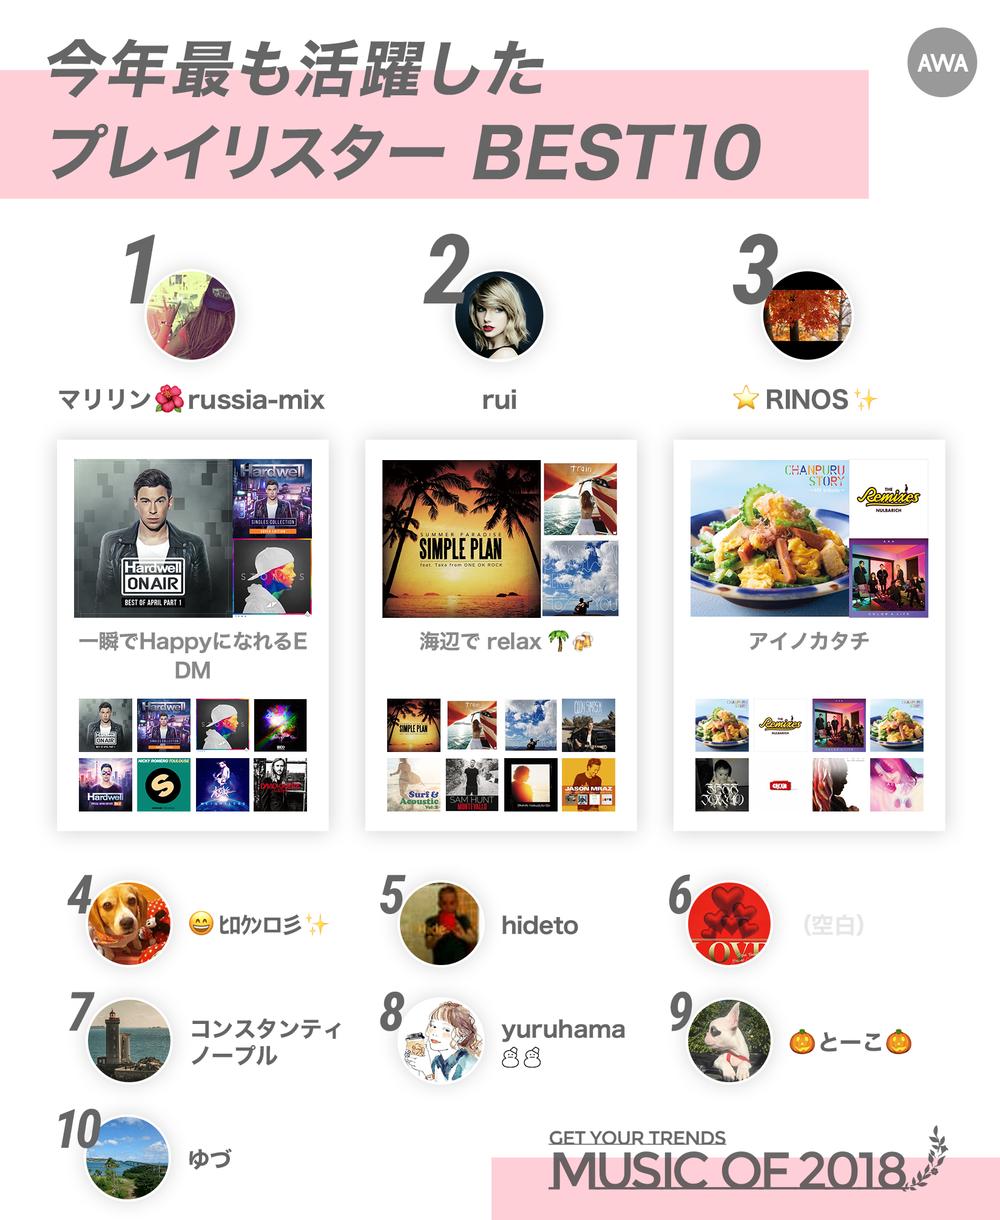 1127_GetYourTrends2018_Ranking_04BestPlayliser.png